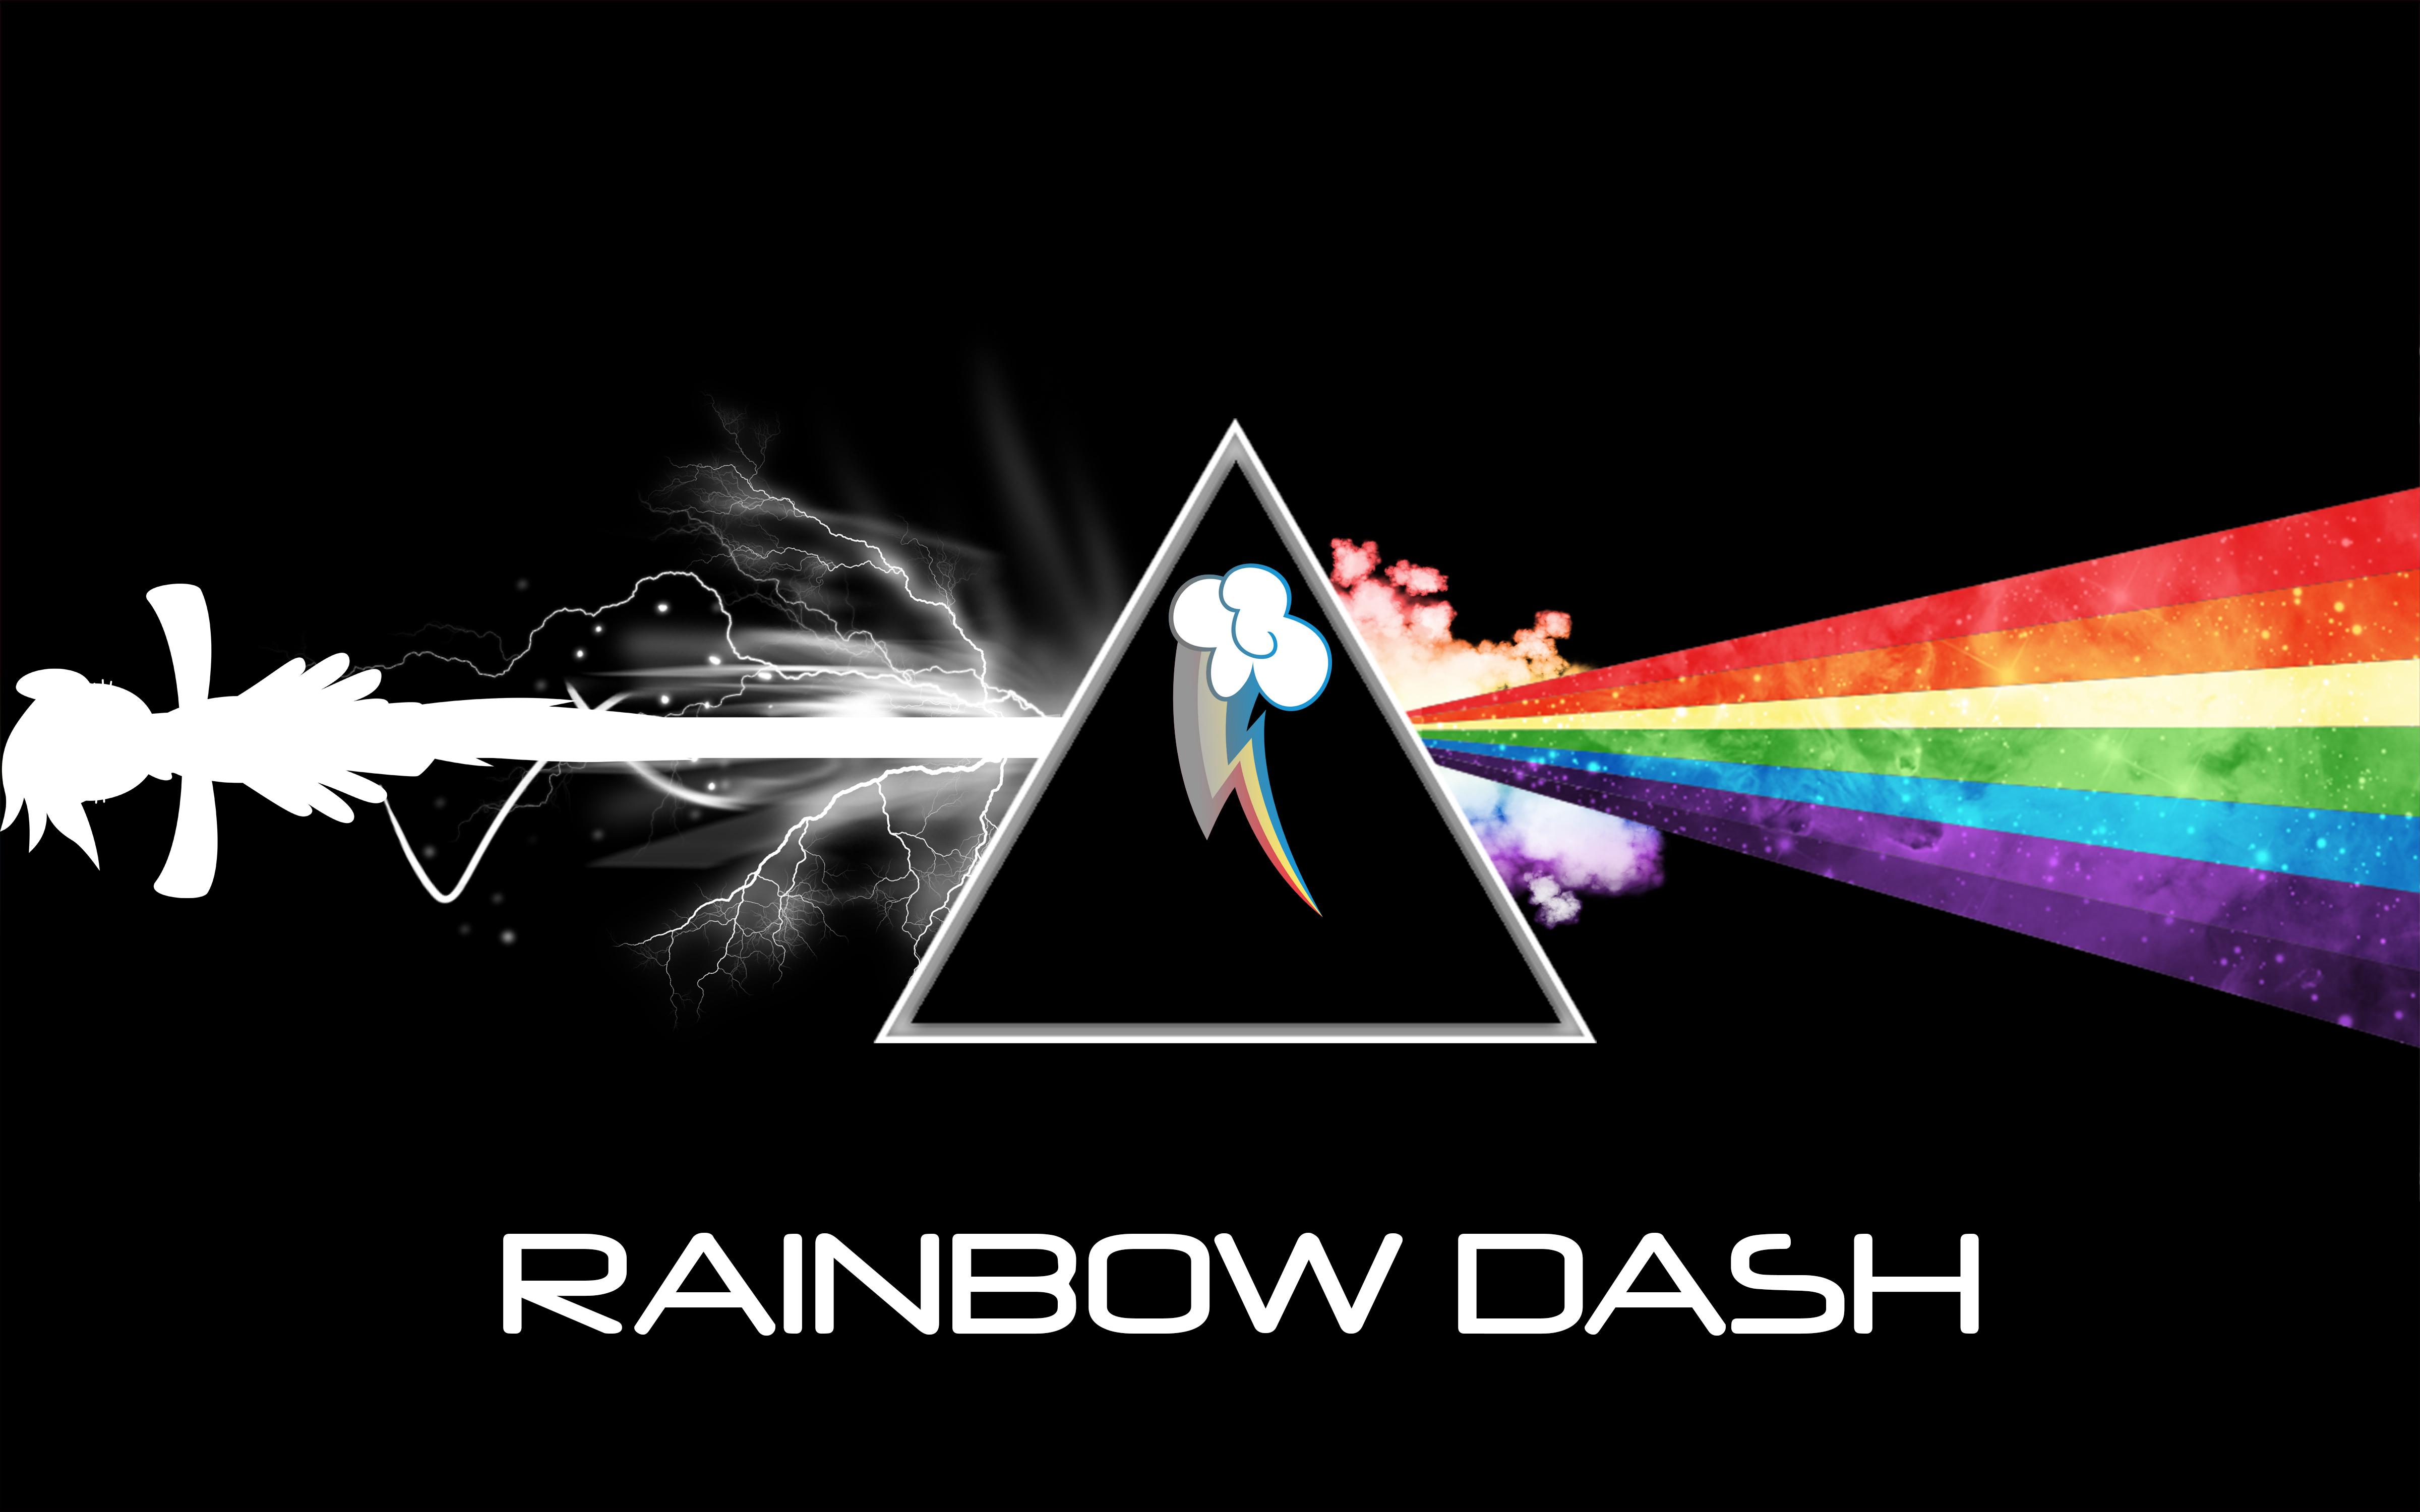 Pink Floyd Quotes Wallpaper Rainbow Dash Wallpaper High Quality Pixelstalk Net